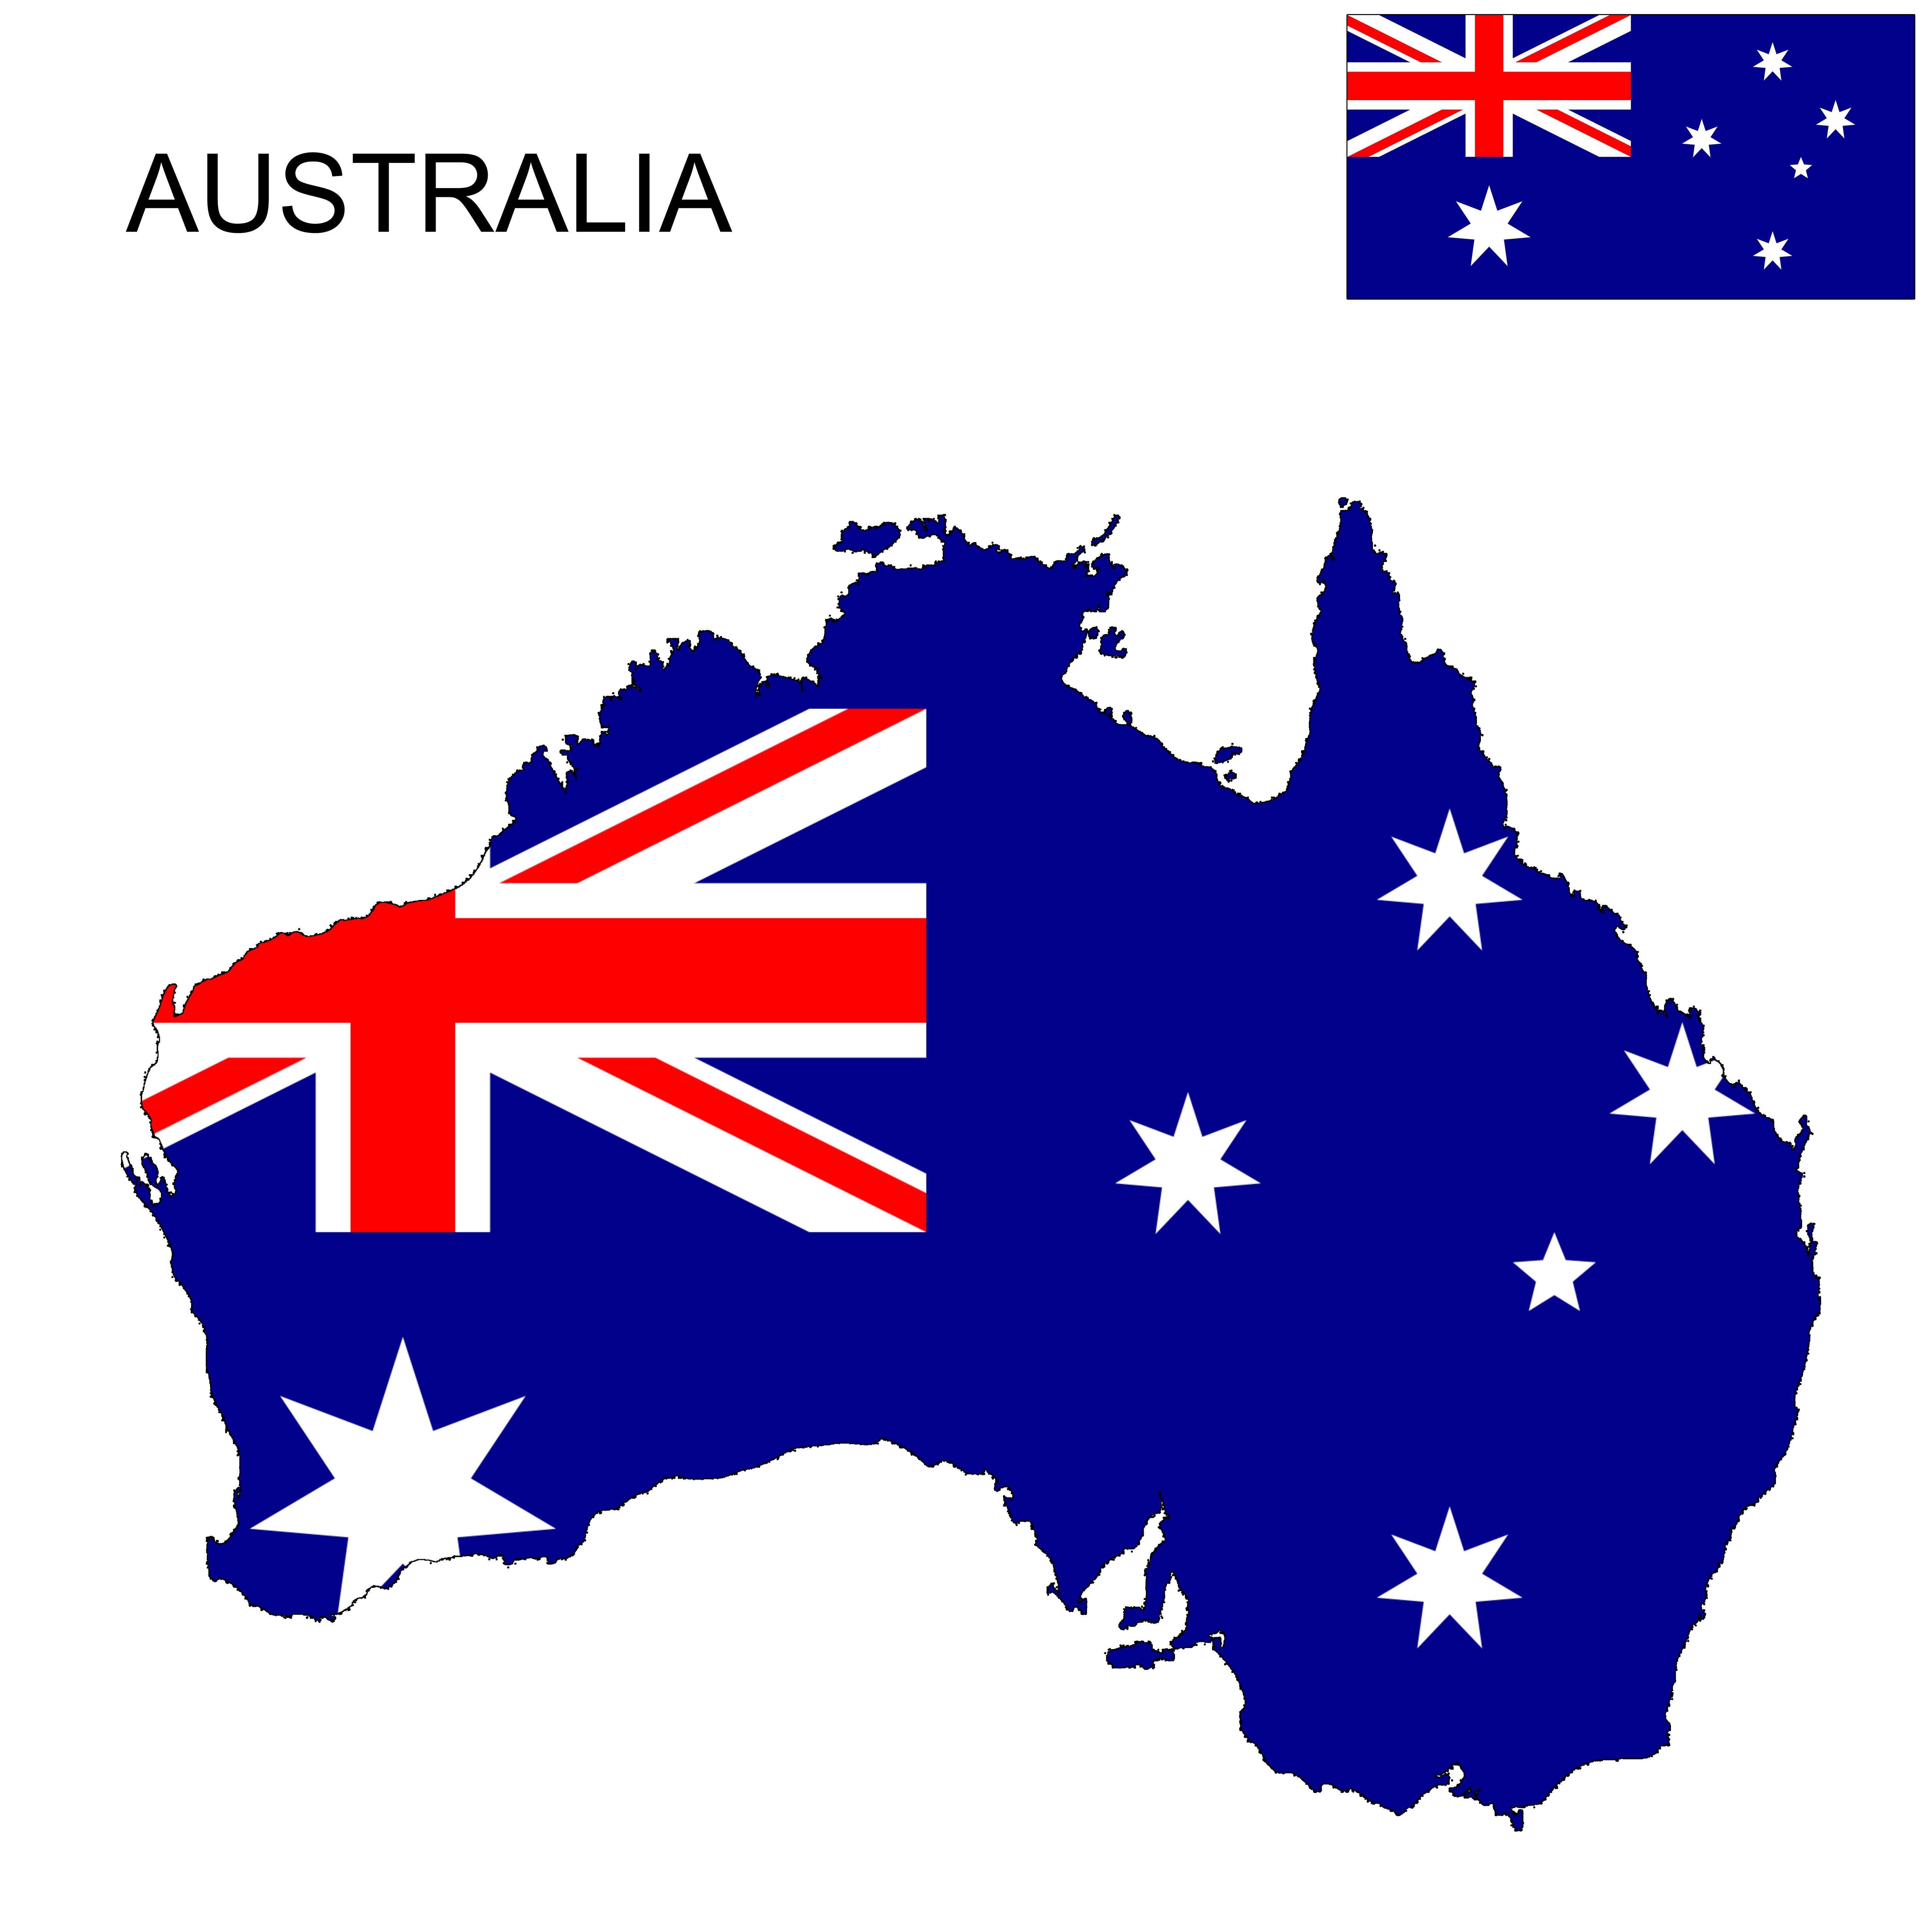 Australia flag map australia flag australia map